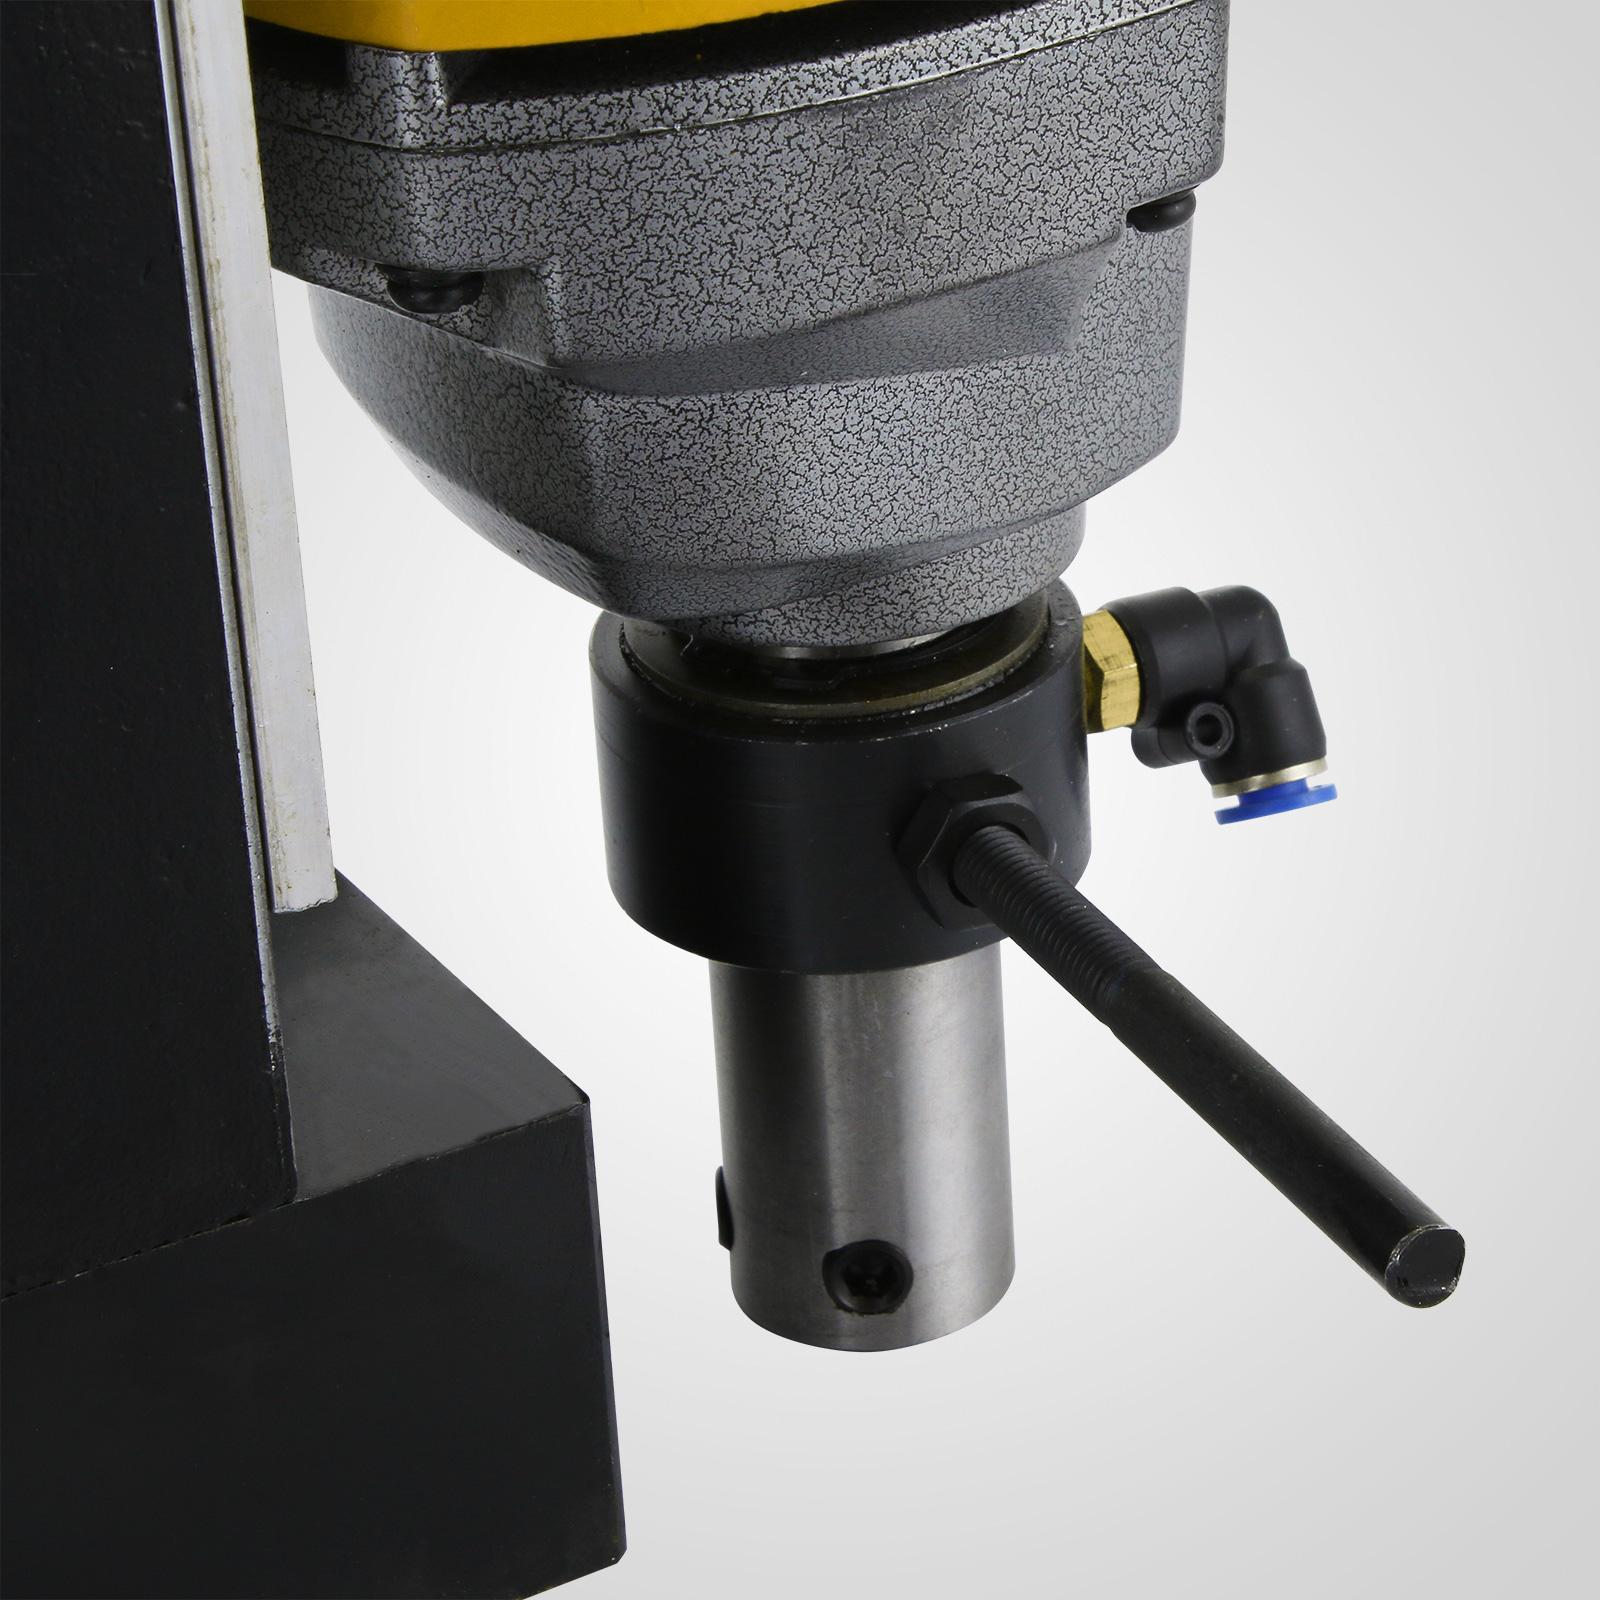 MB23-BRM35-MD40-Trapano-Perforatrice-Carotatore-Fresa-Magnetico-12-40mm-230V miniatura 22